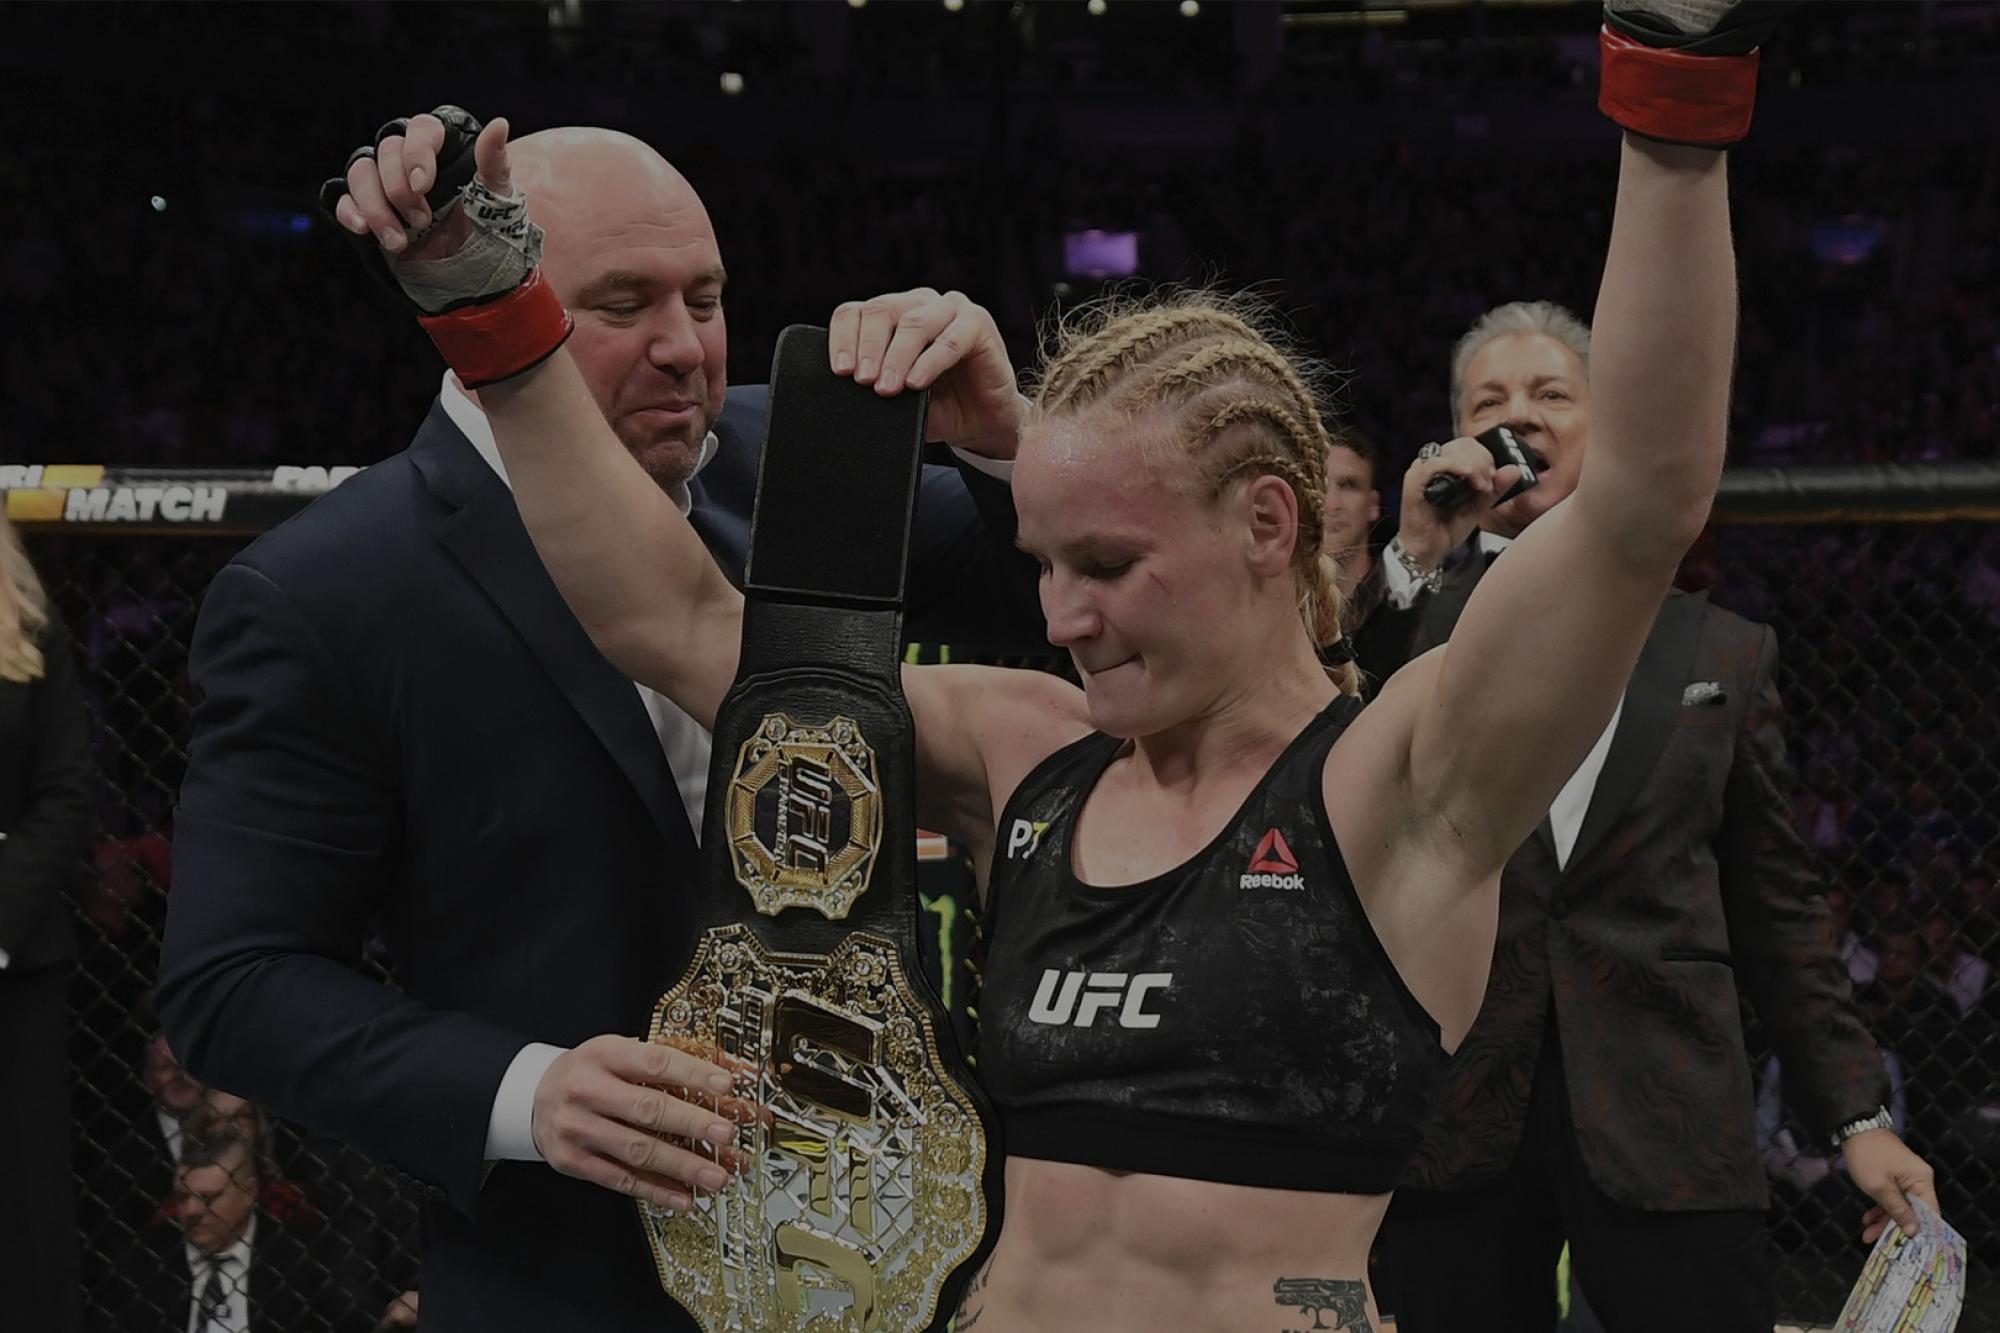 UFC 238 Adds Shevchenko vs Eye and A Few More